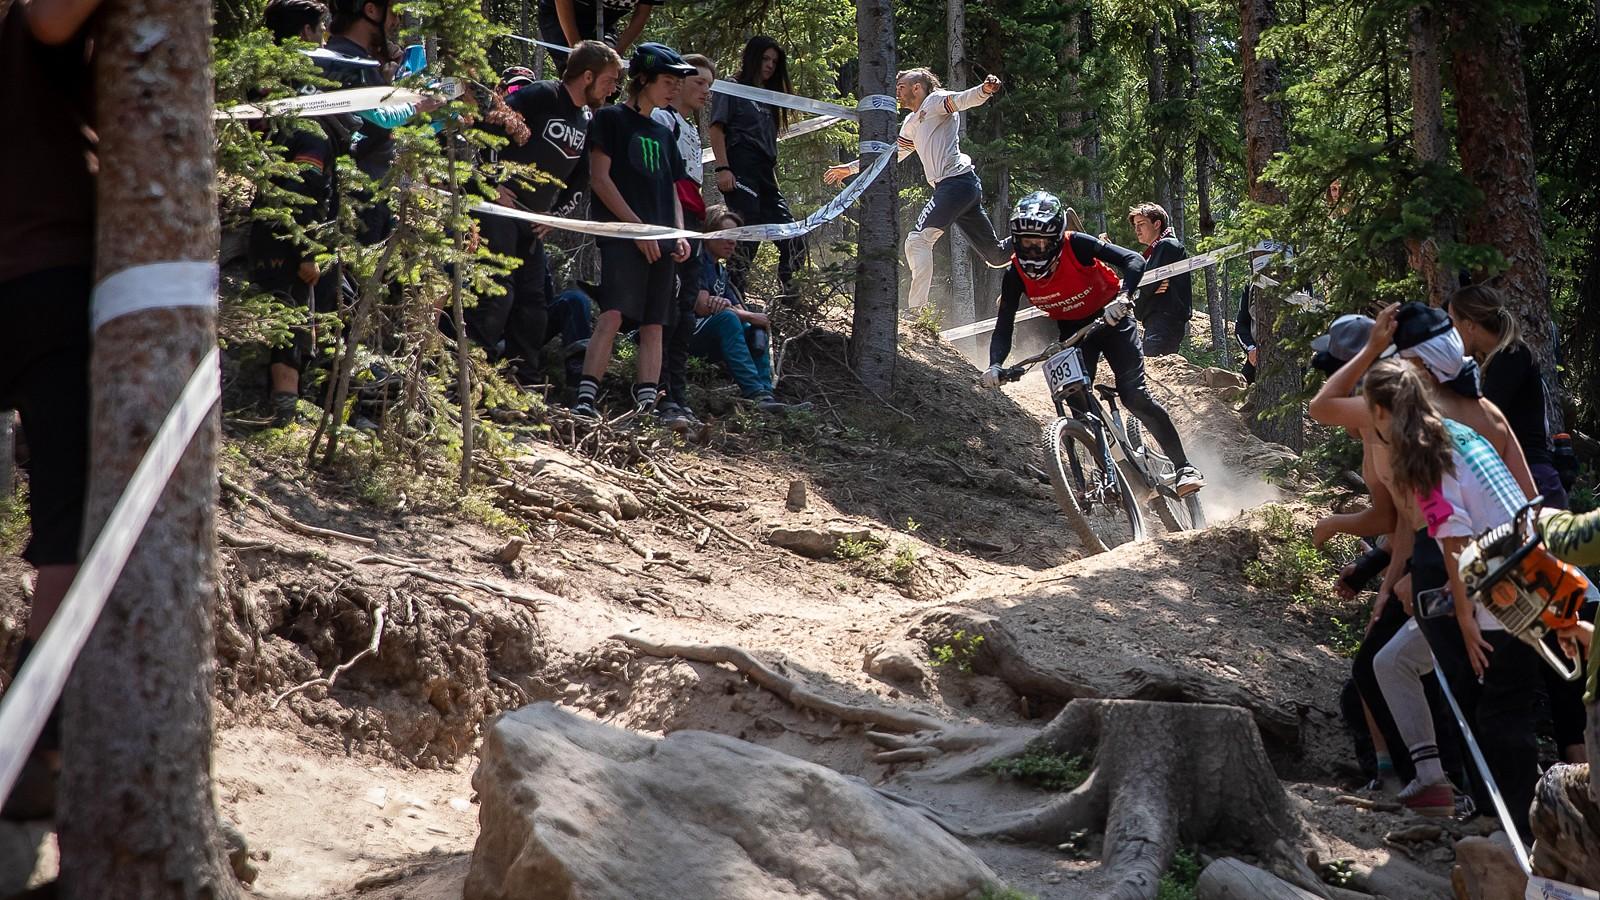 Keegan Rowley - US National Champs Downhill Photo Blast - Mountain Biking Pictures - Vital MTB